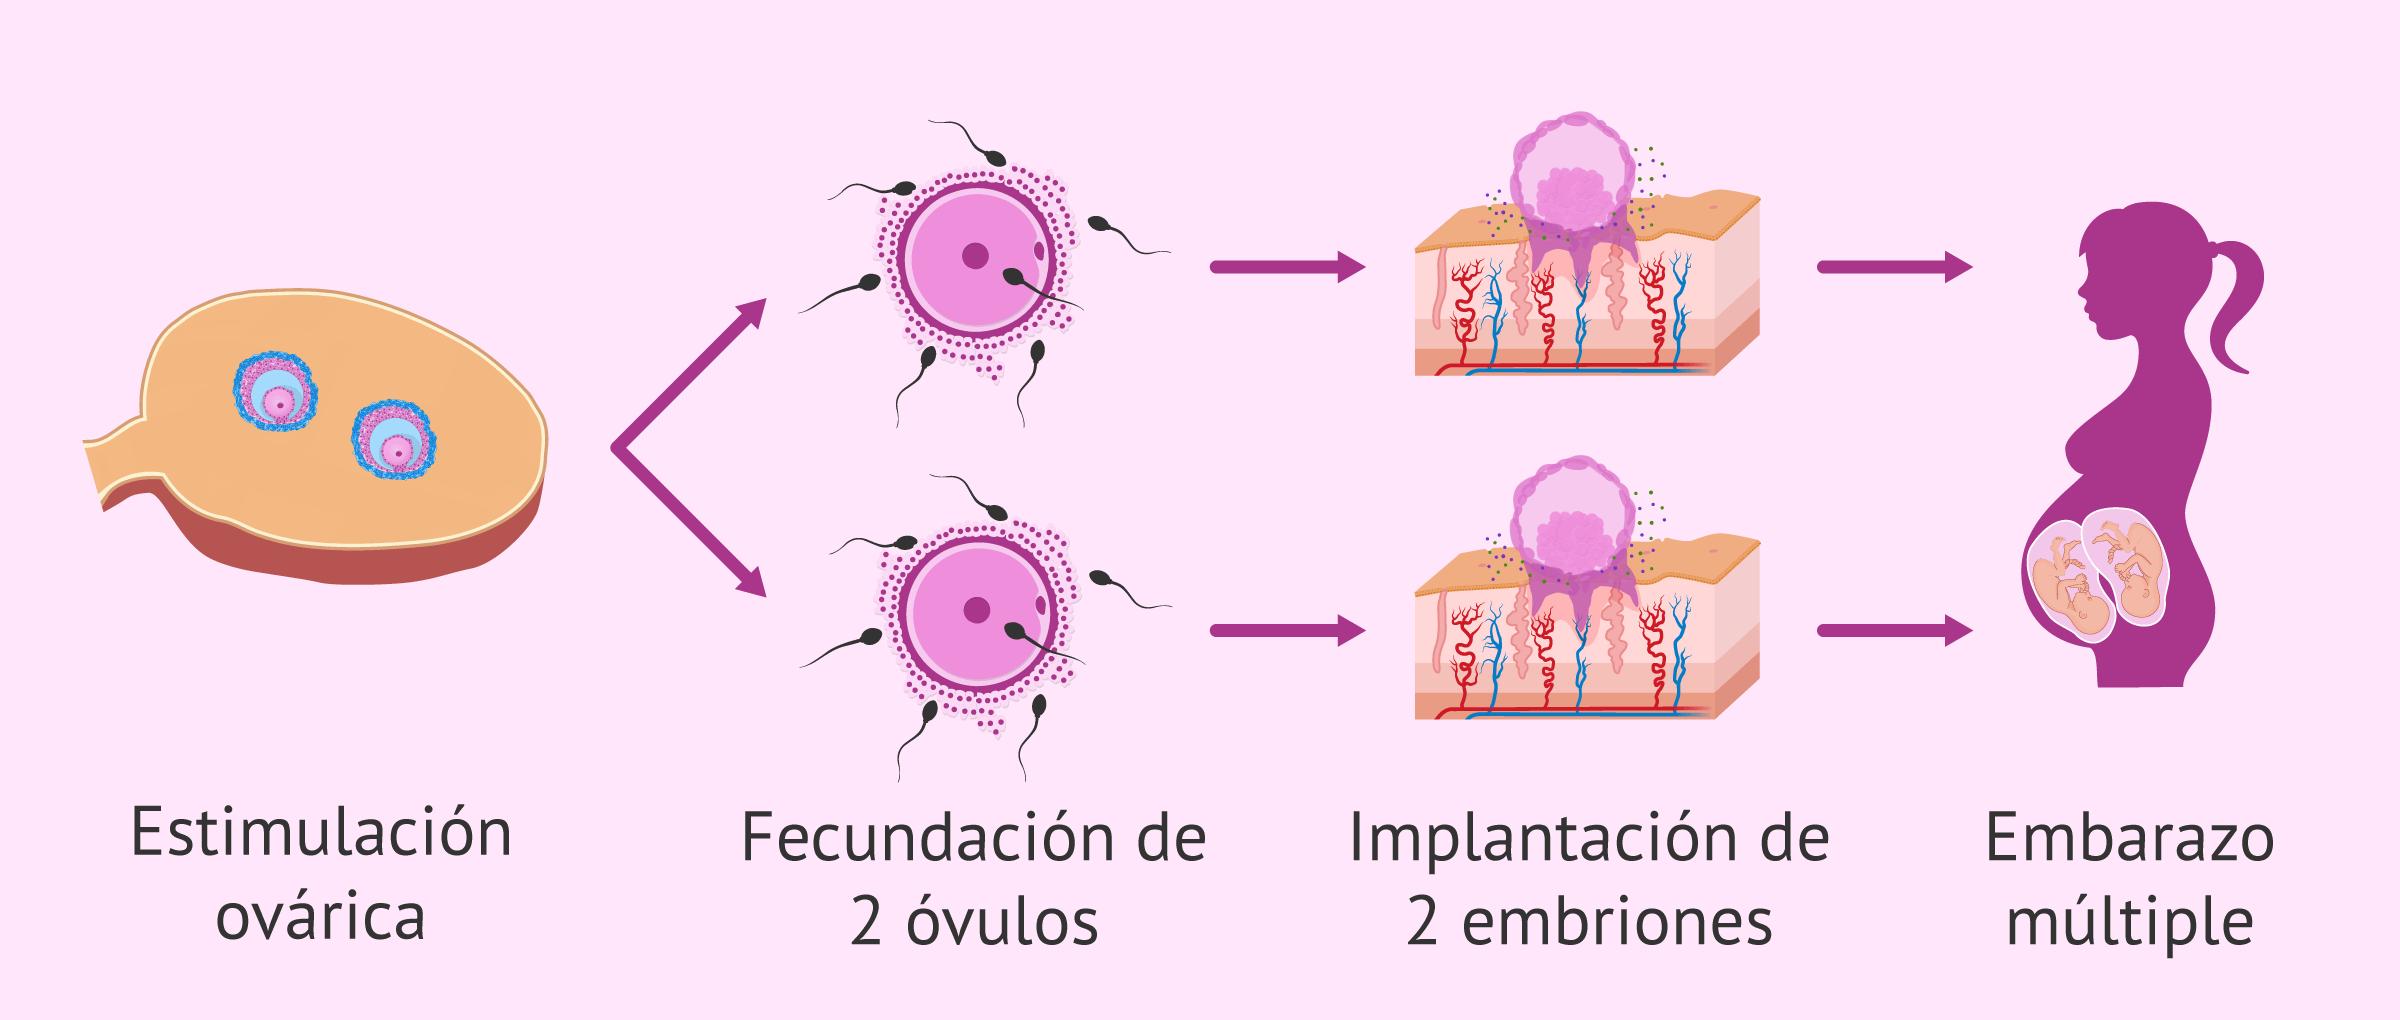 Embarazo múltiple por inseminación artificial (IA)